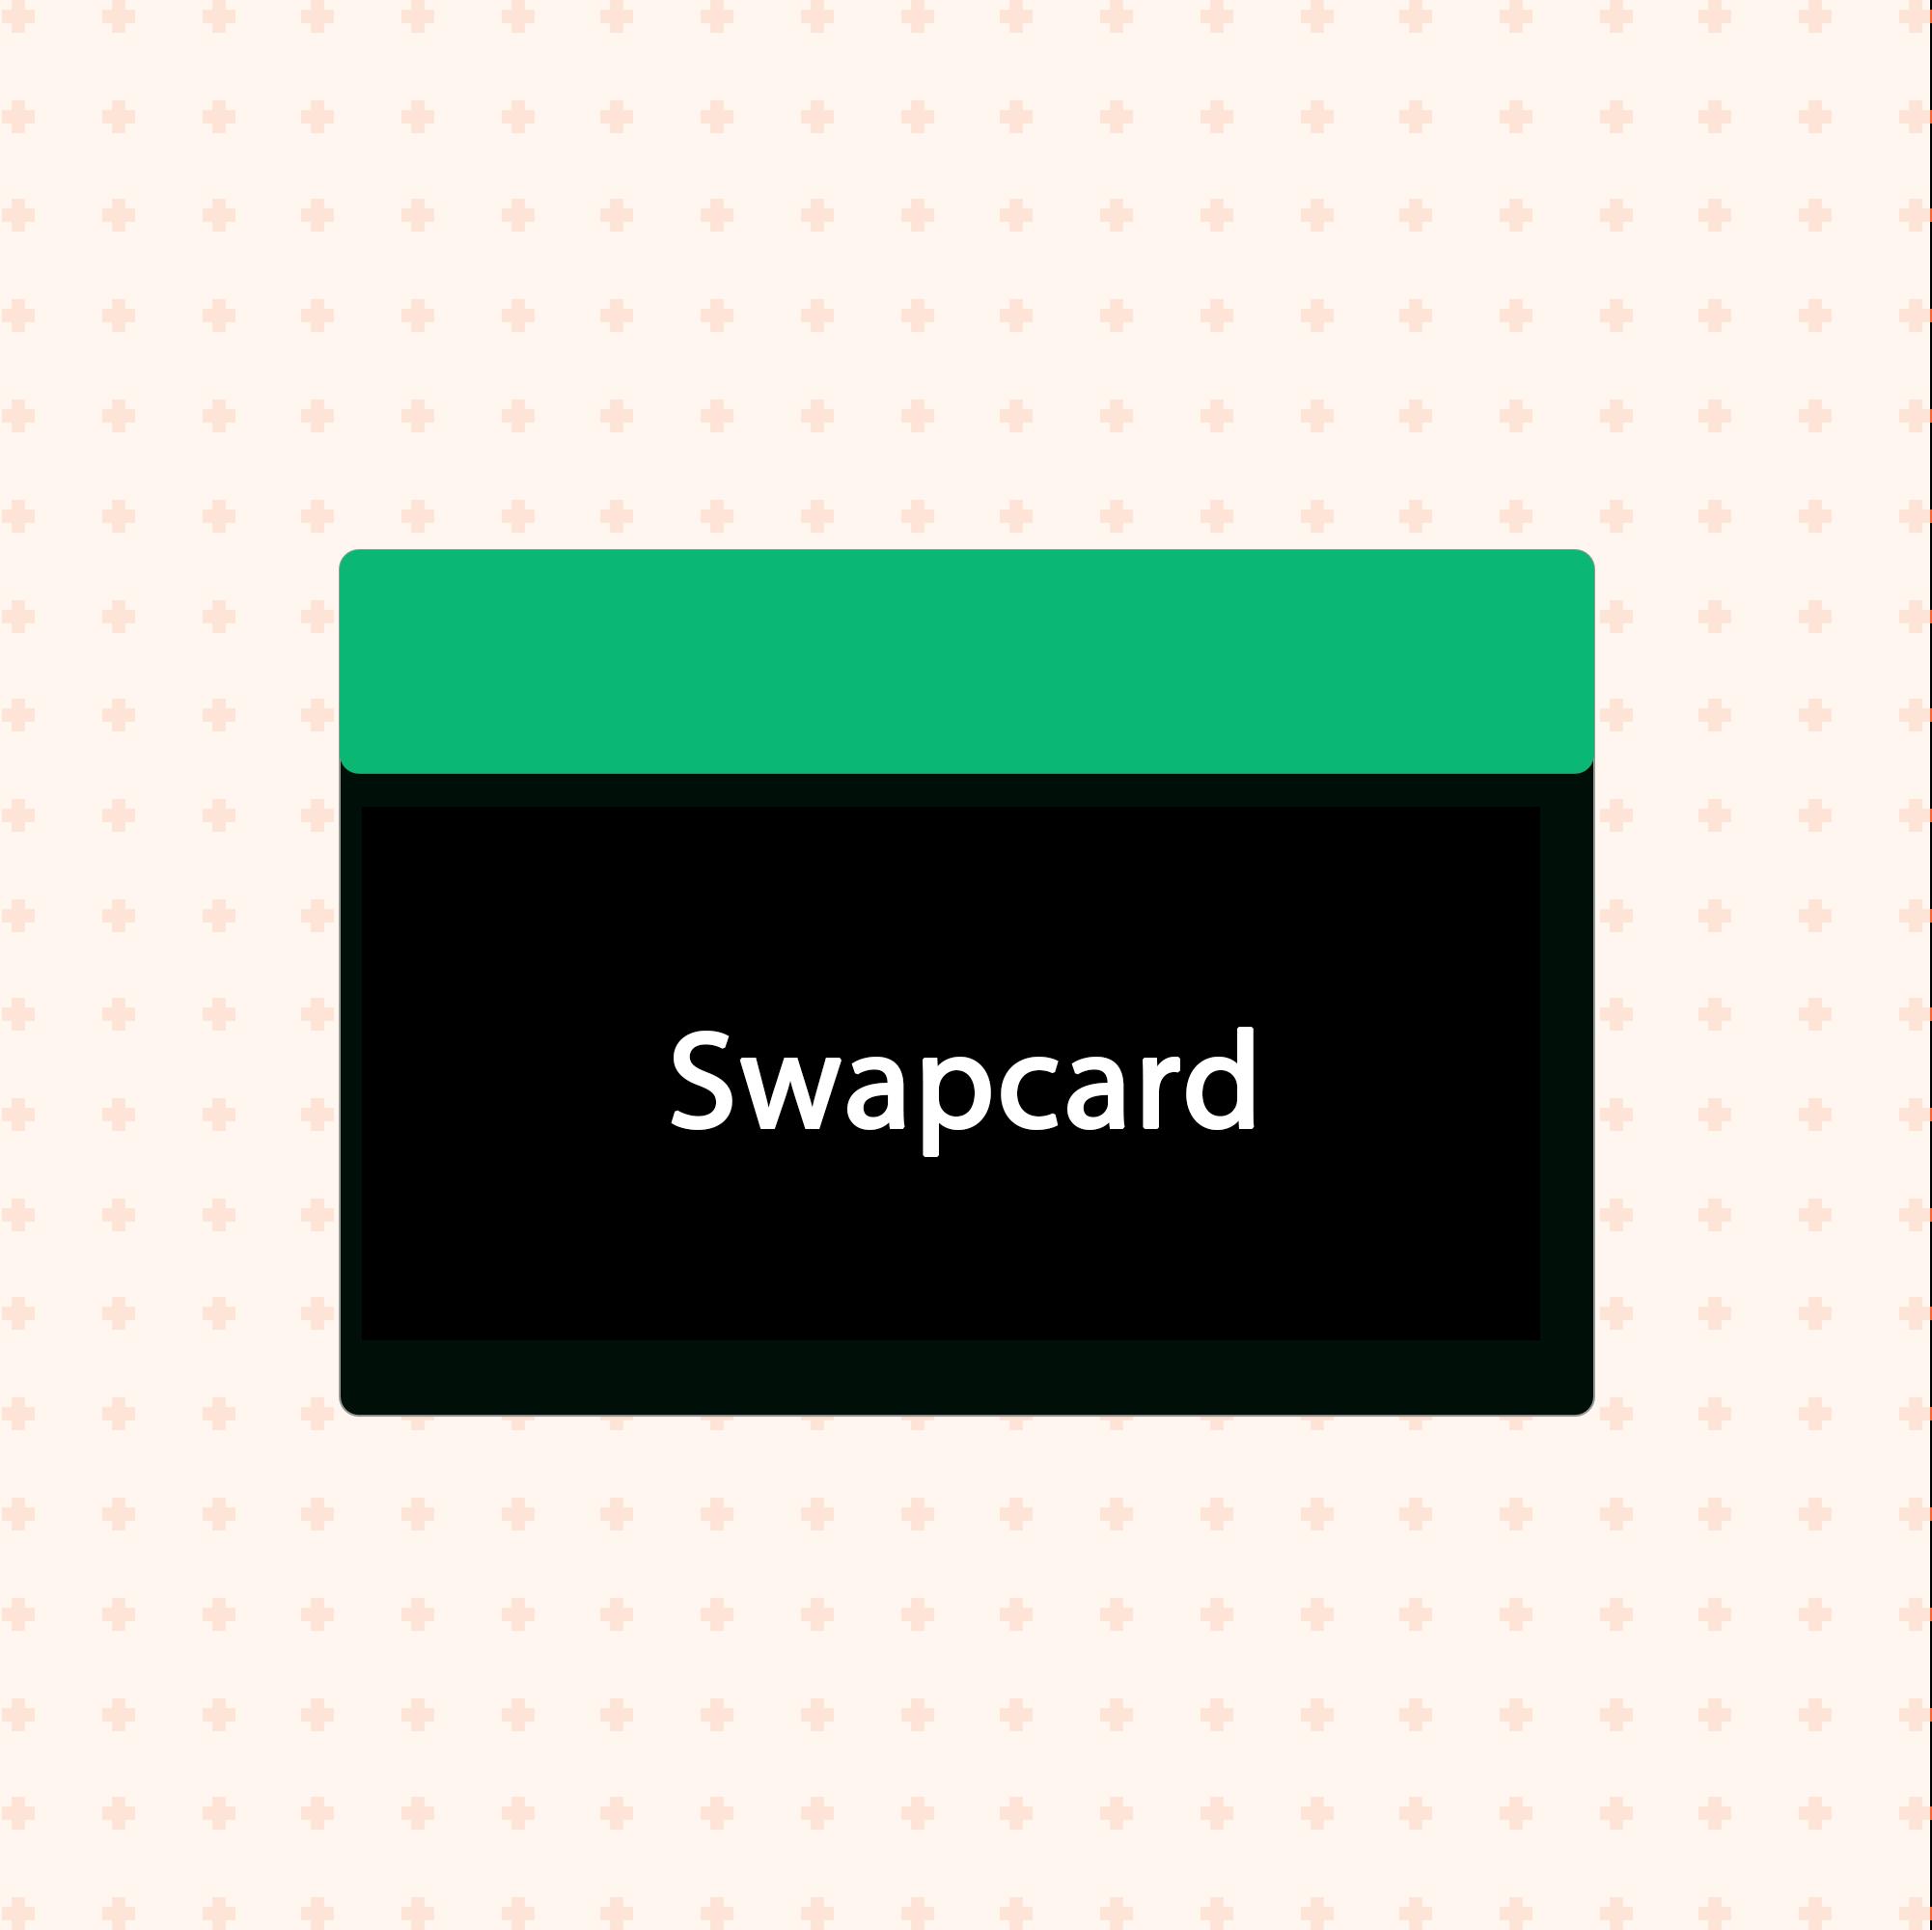 https://spotme.com/wp-content/uploads/2020/06/Swapcard2.png